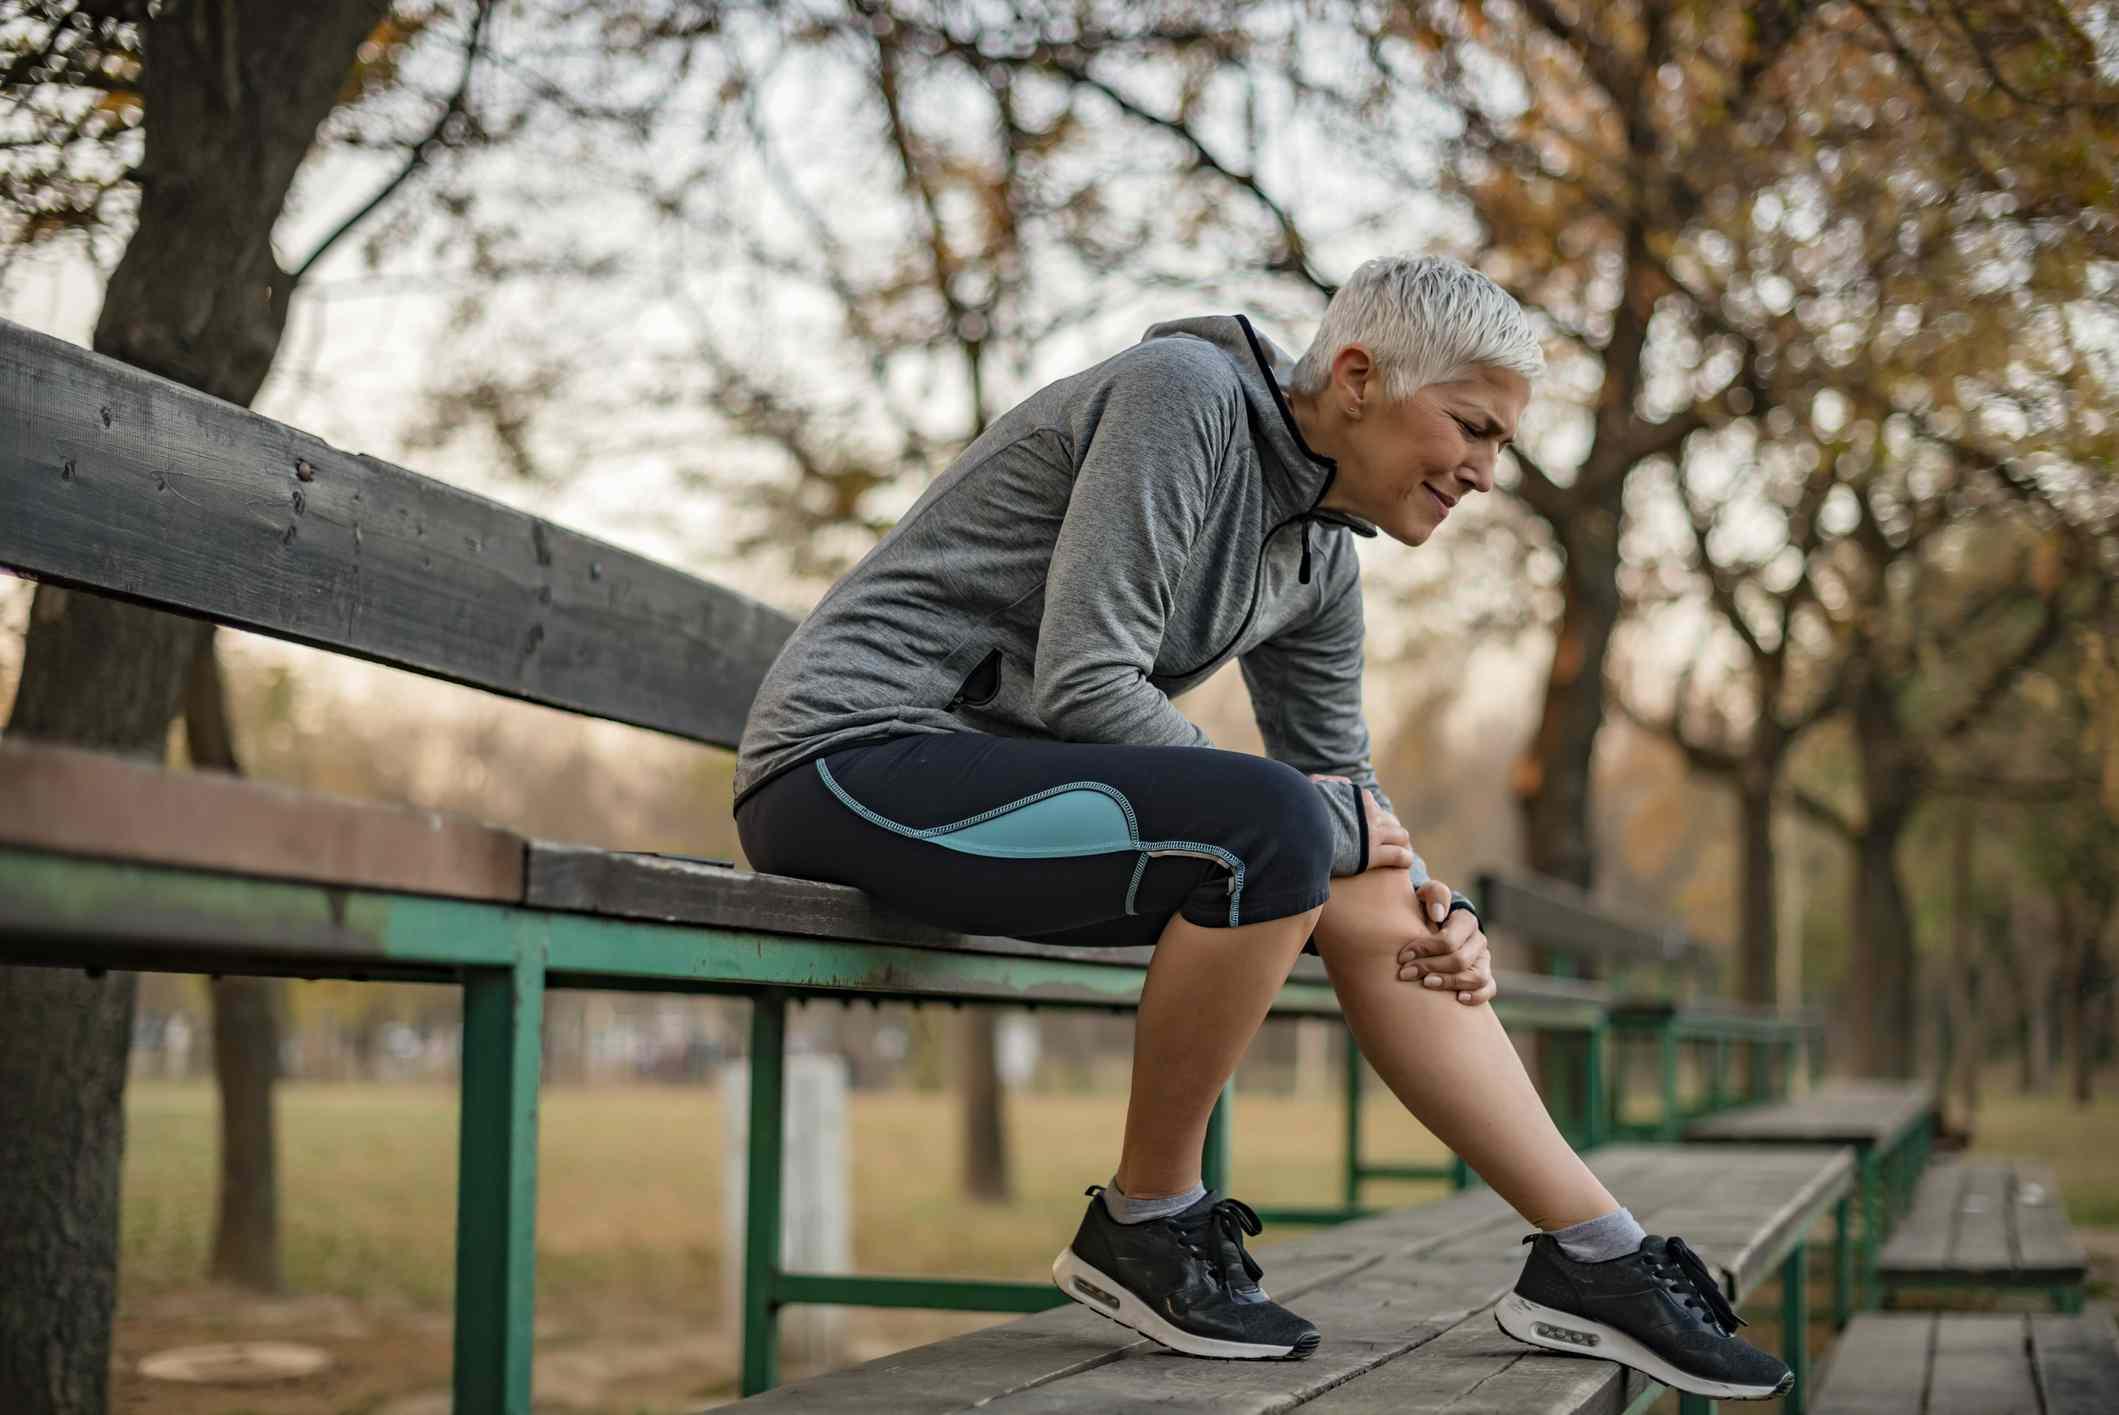 Psoriatic Arthritis Prognosis and Quality of Life